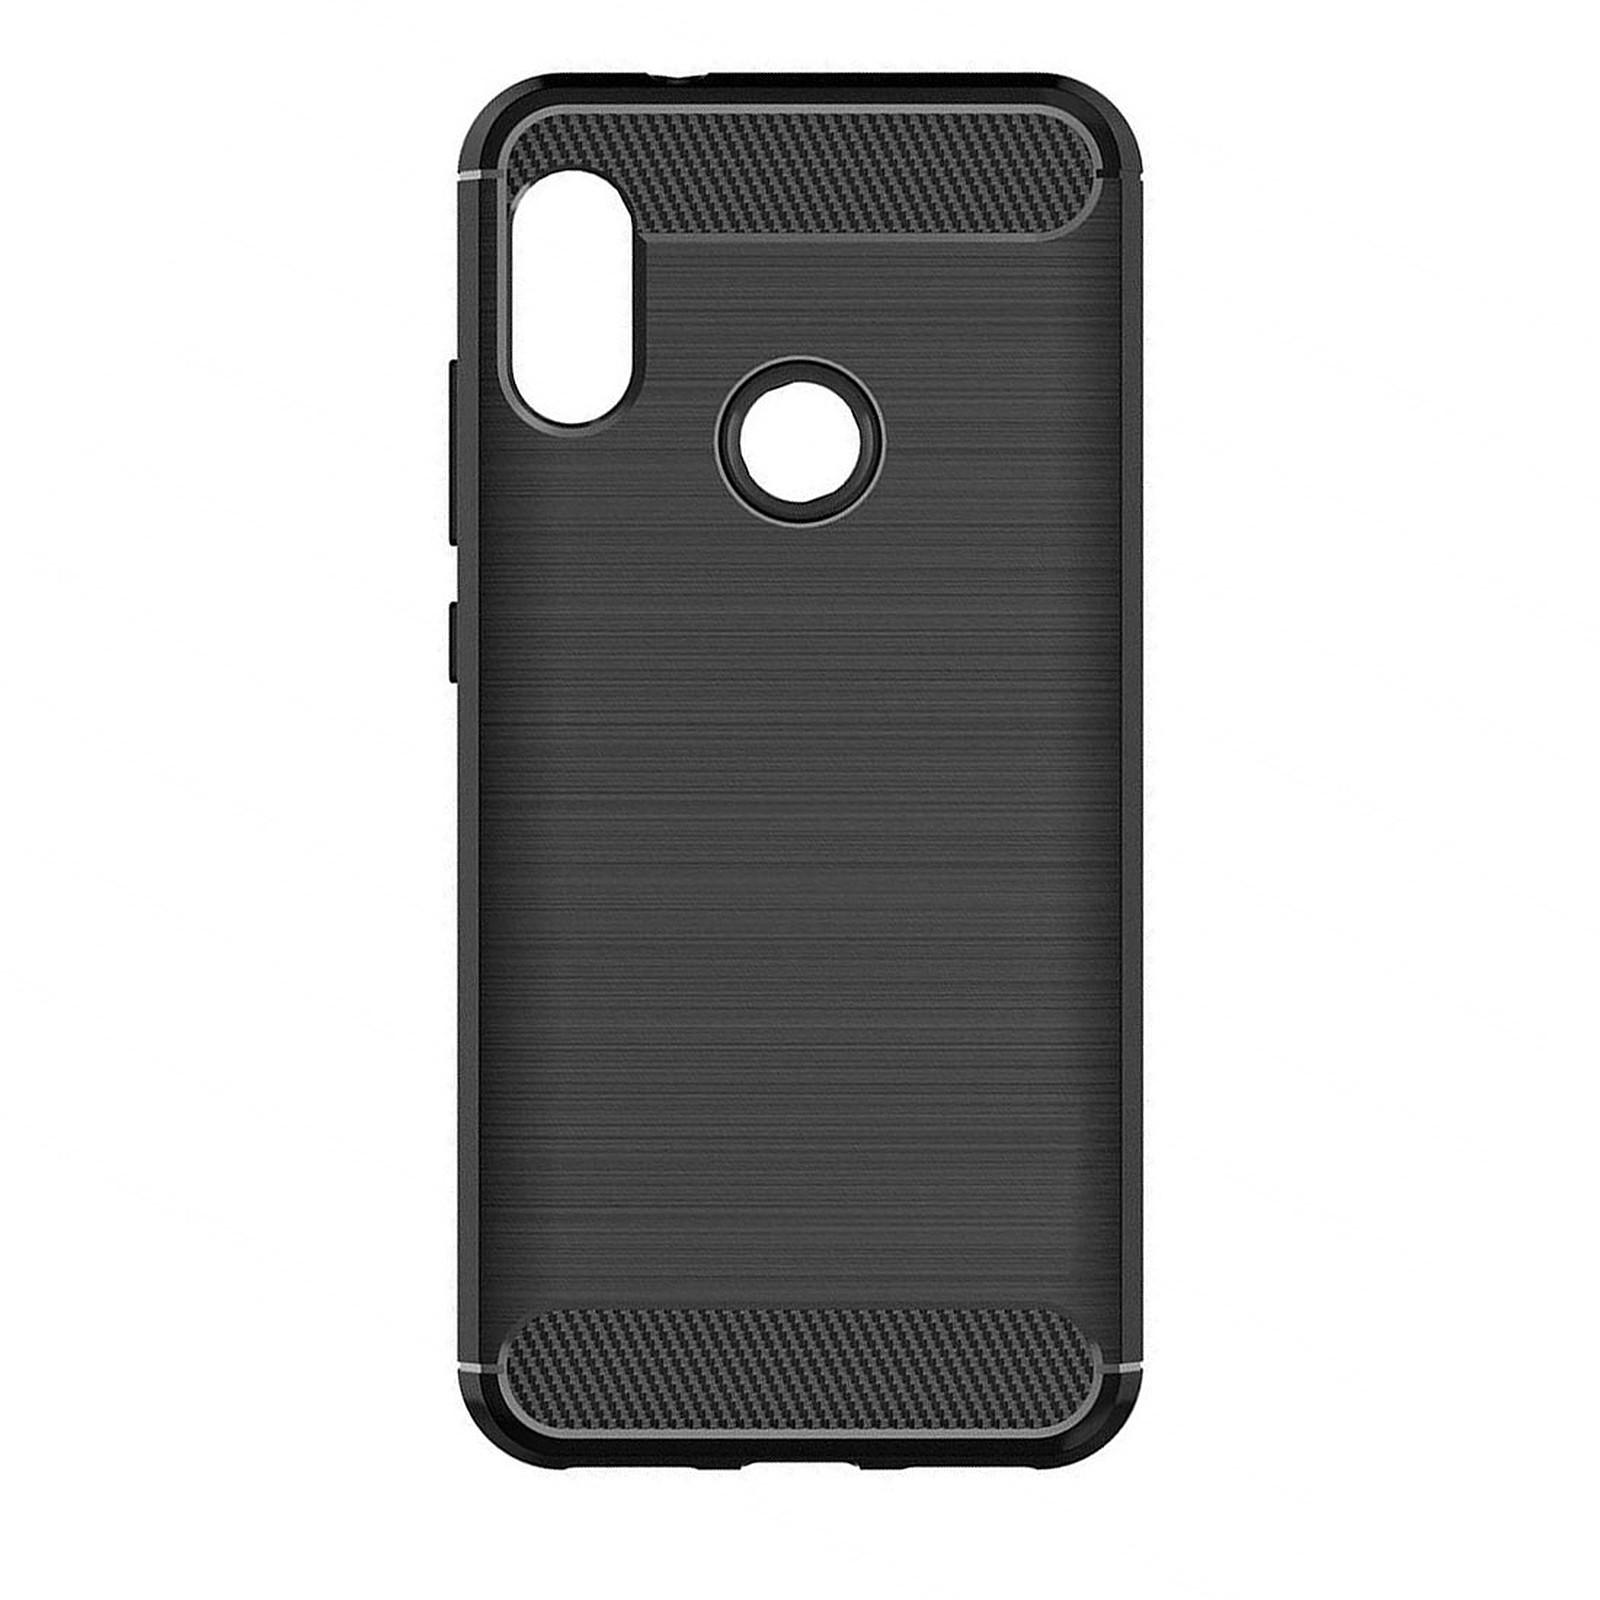 Funda para Xiaomi Mi A2 Lite - Negra